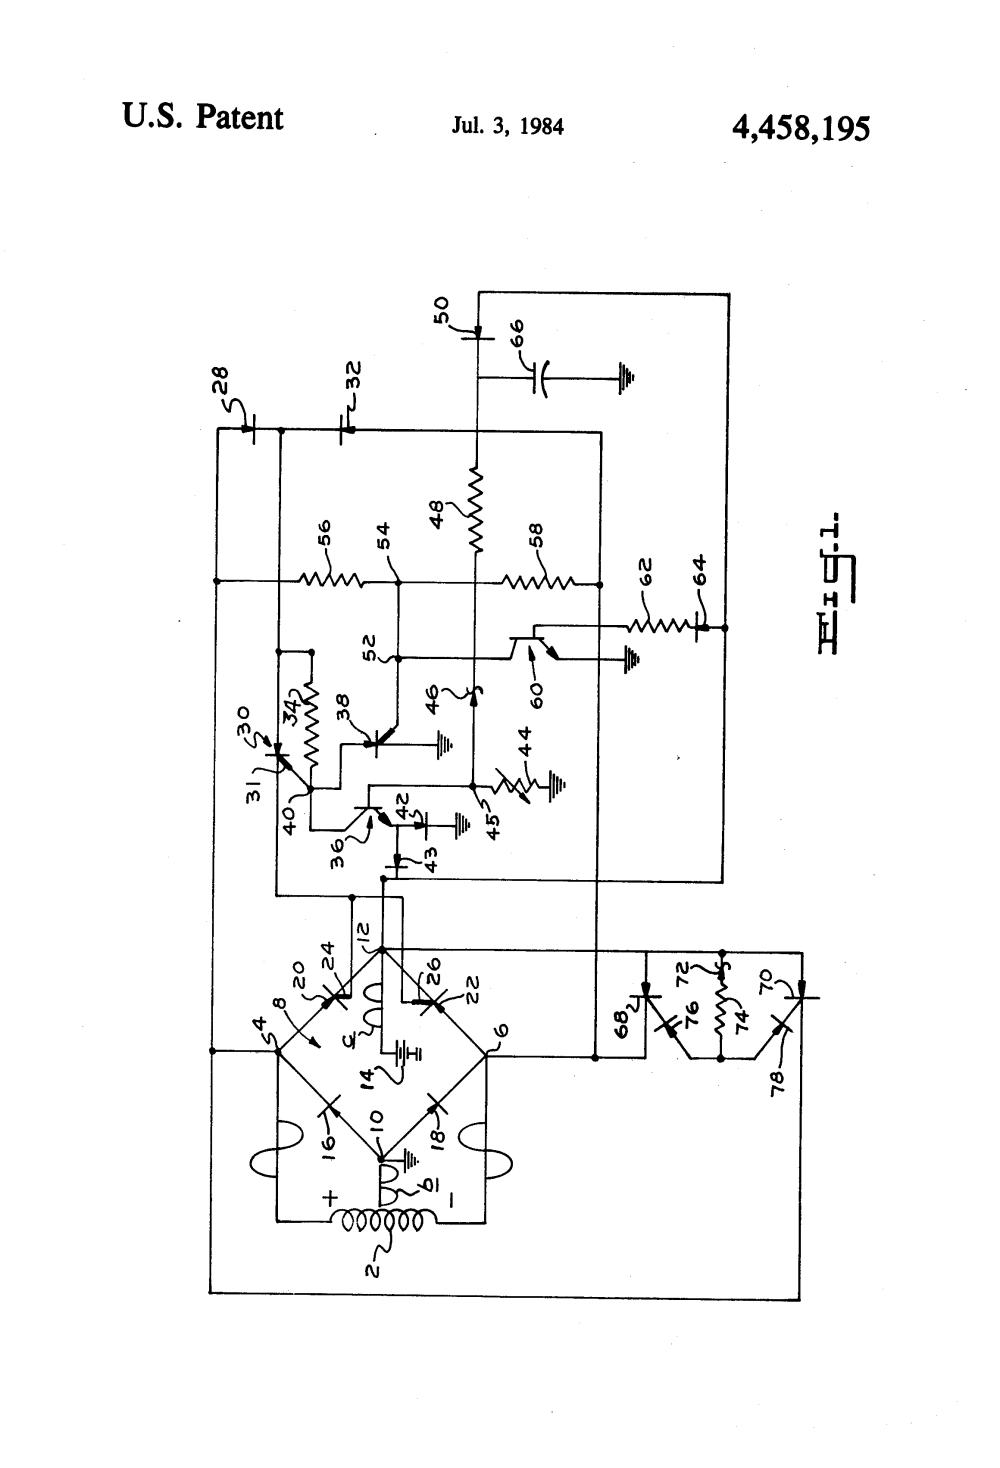 medium resolution of  patent us4458195 electronic regulator for alternator battery on rx300 battery cable harness tympanium regulator wiring diagram